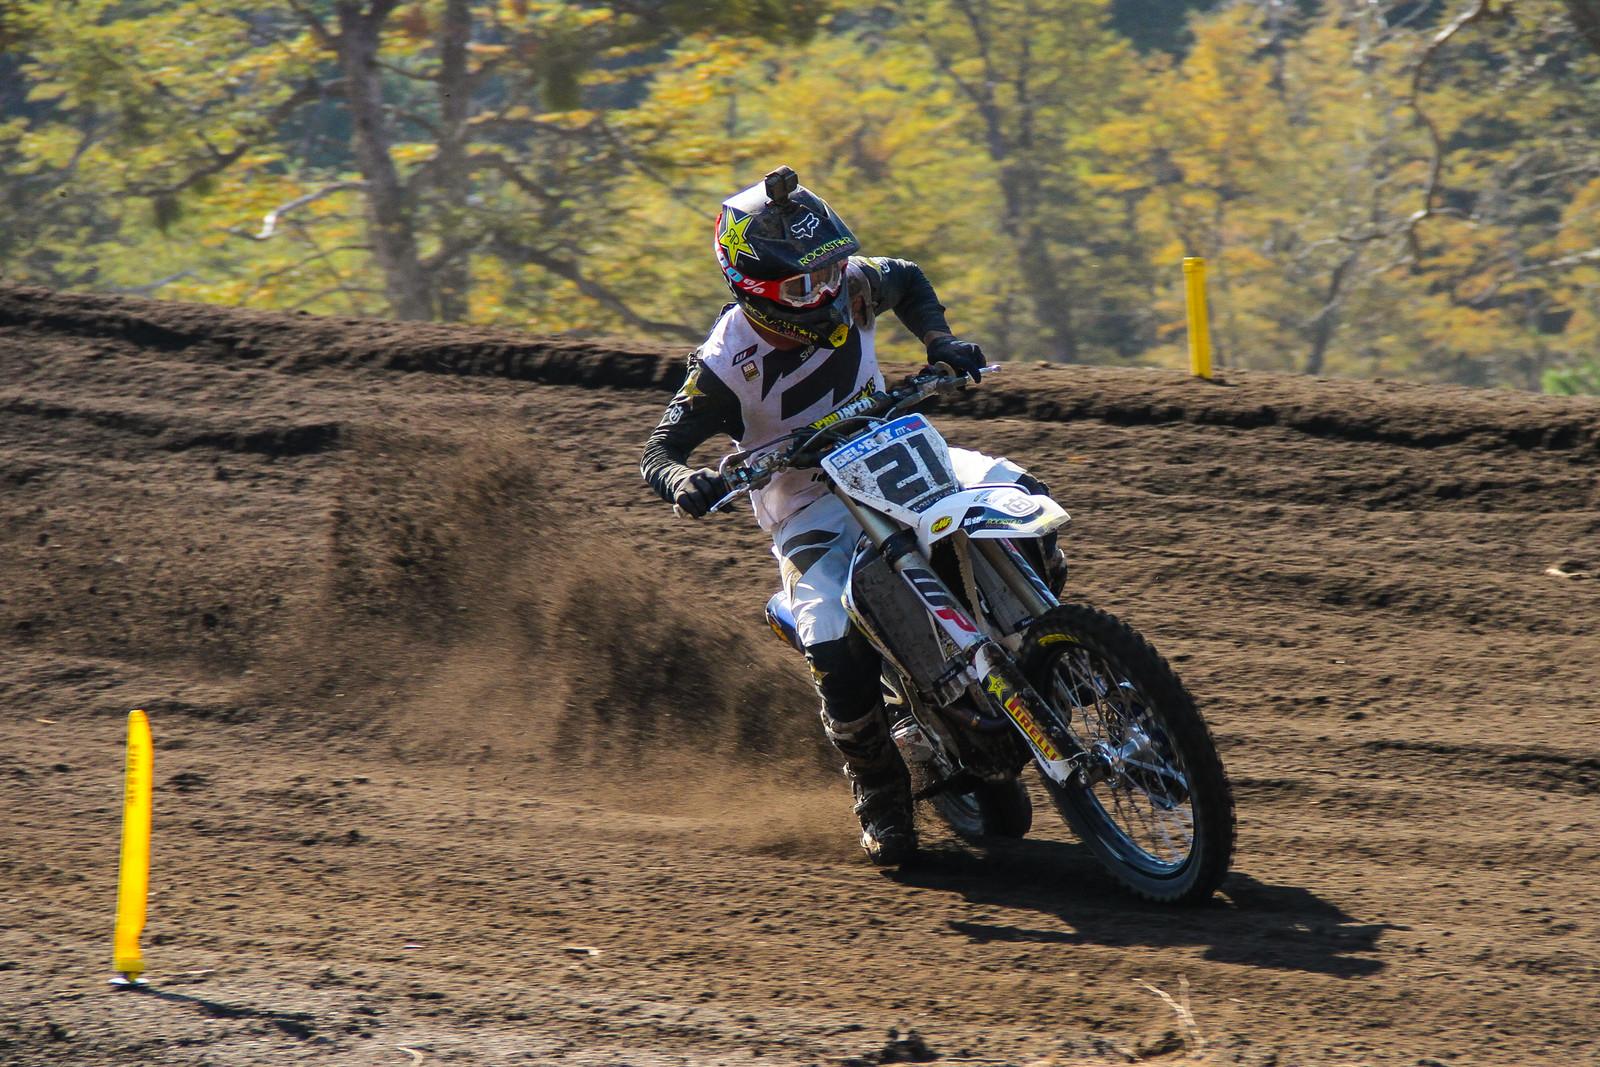 Gautier Paulin - Photo Blast: 2017 MXGP of Argentina - Motocross Pictures - Vital MX